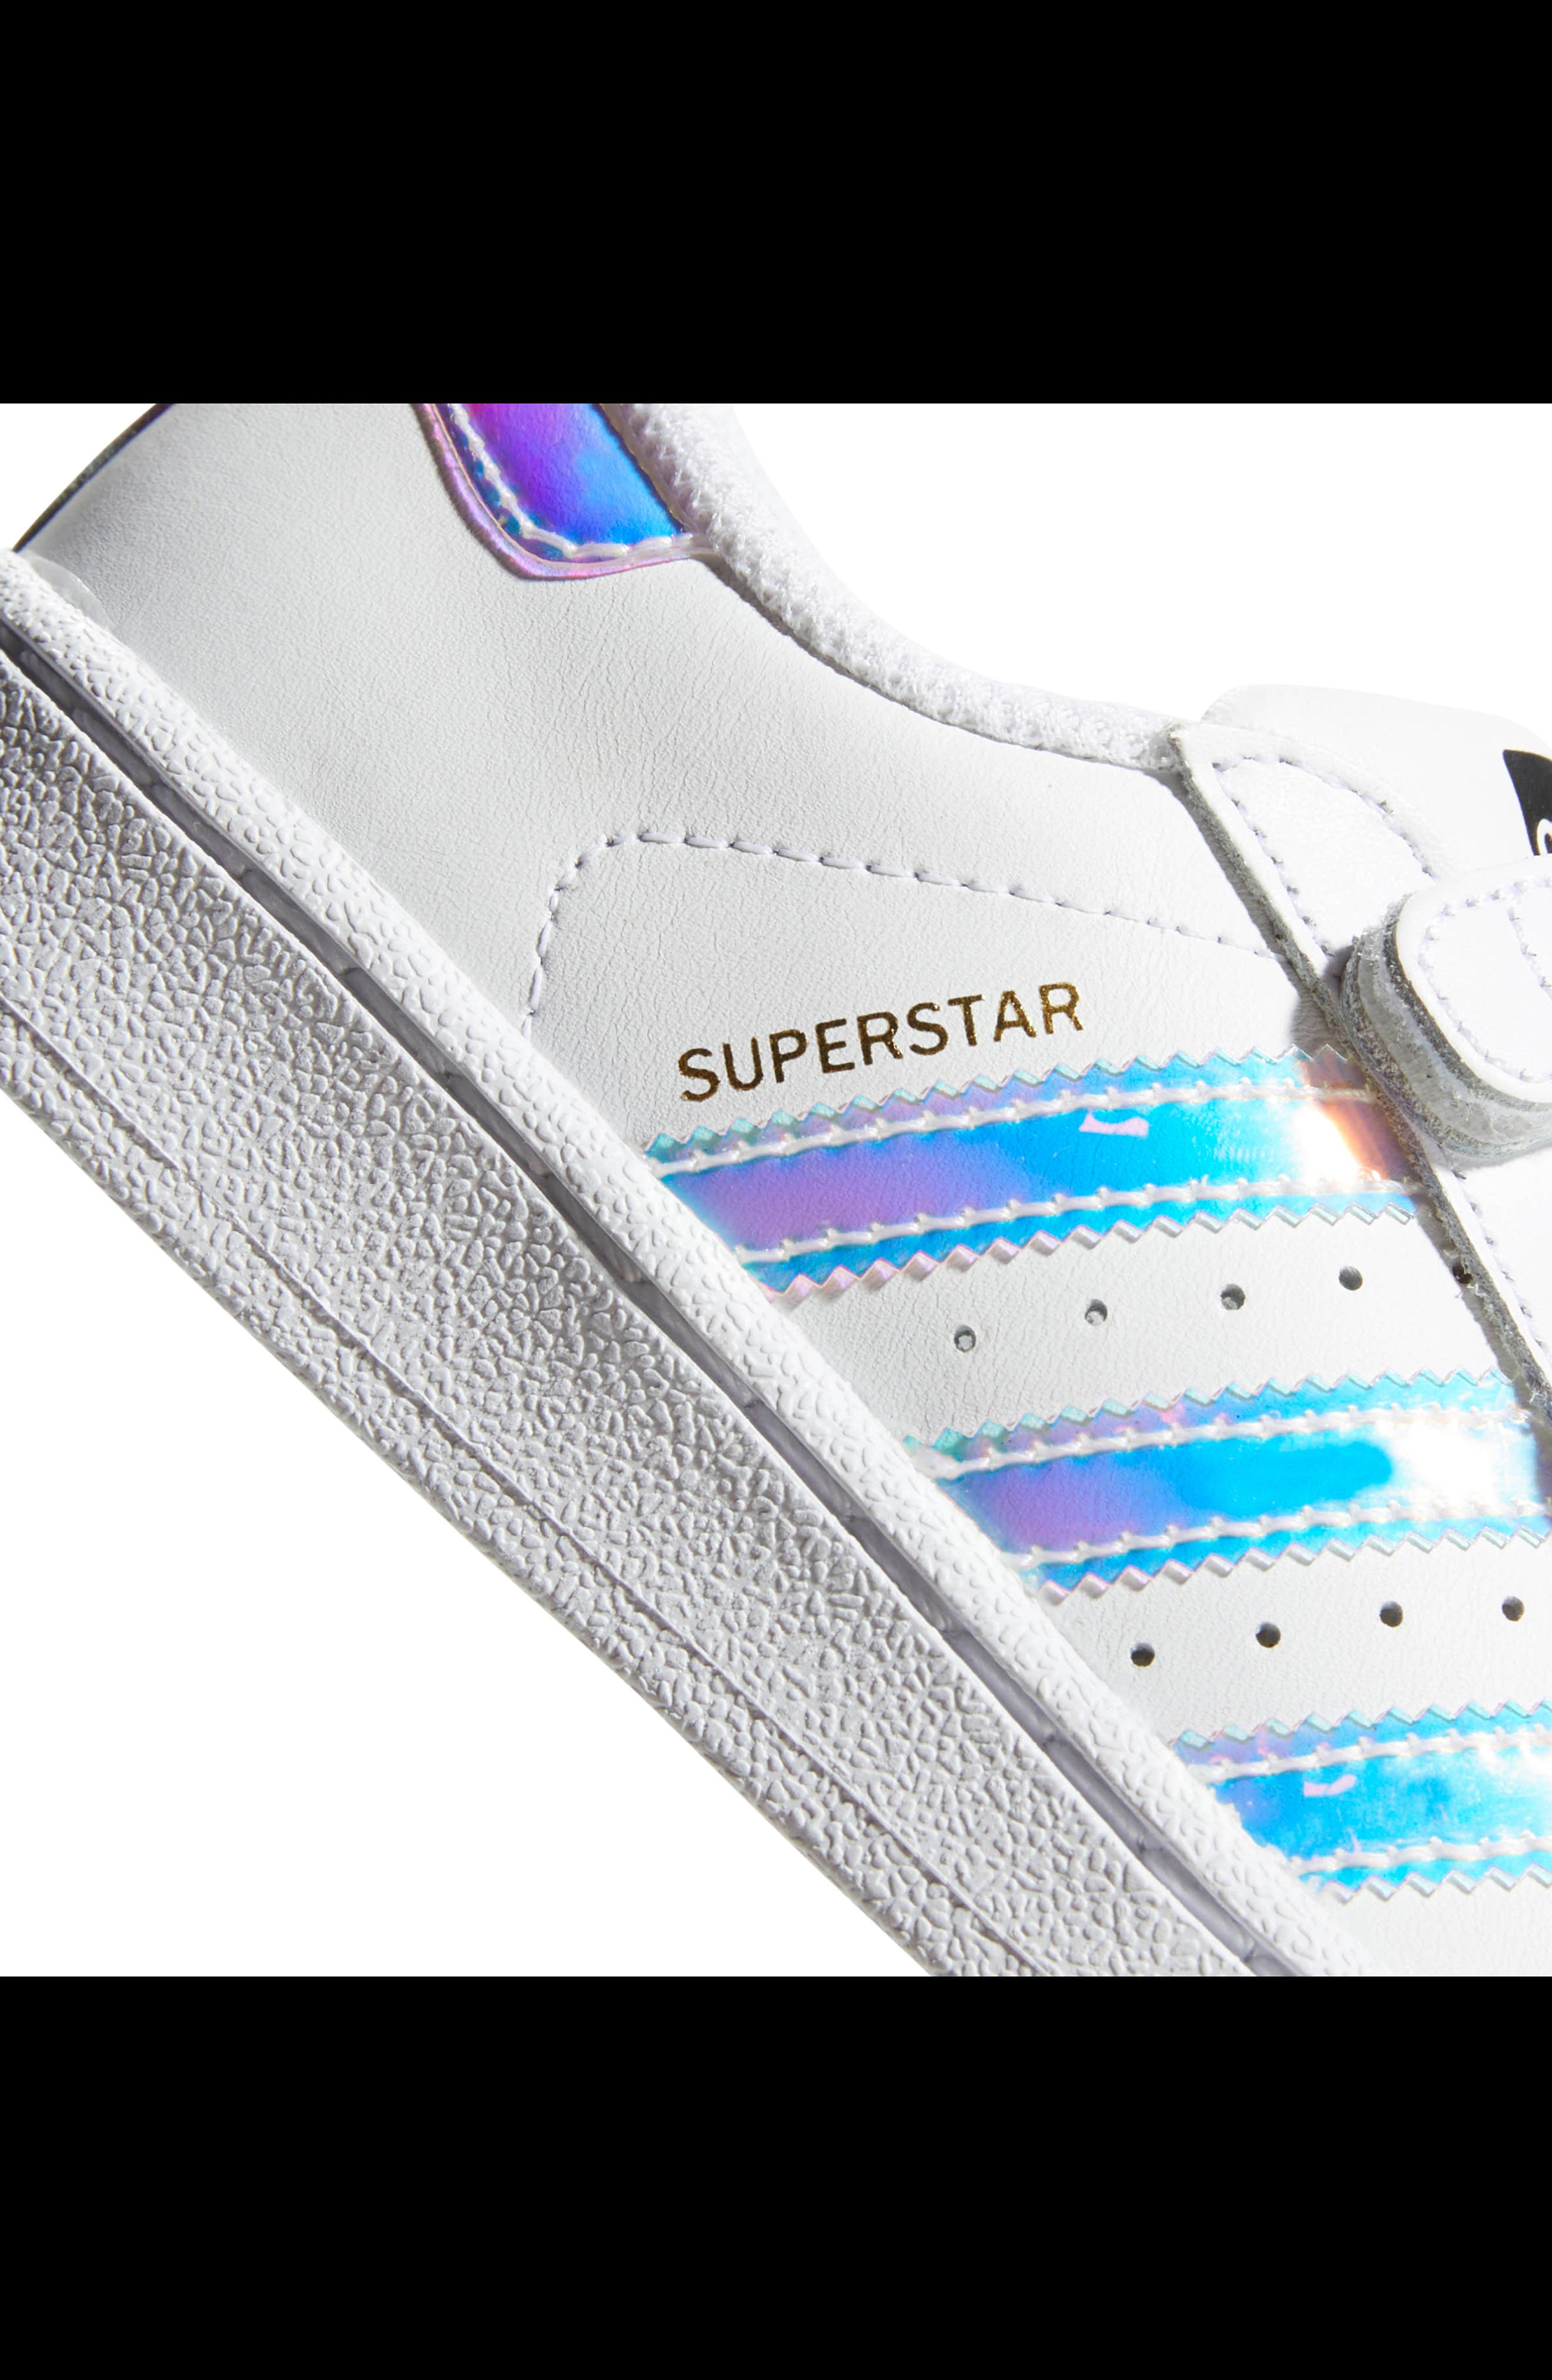 Superstar - Iridescent Sneaker,                             Alternate thumbnail 13, color,                             SILVER METALLIC/ WHITE